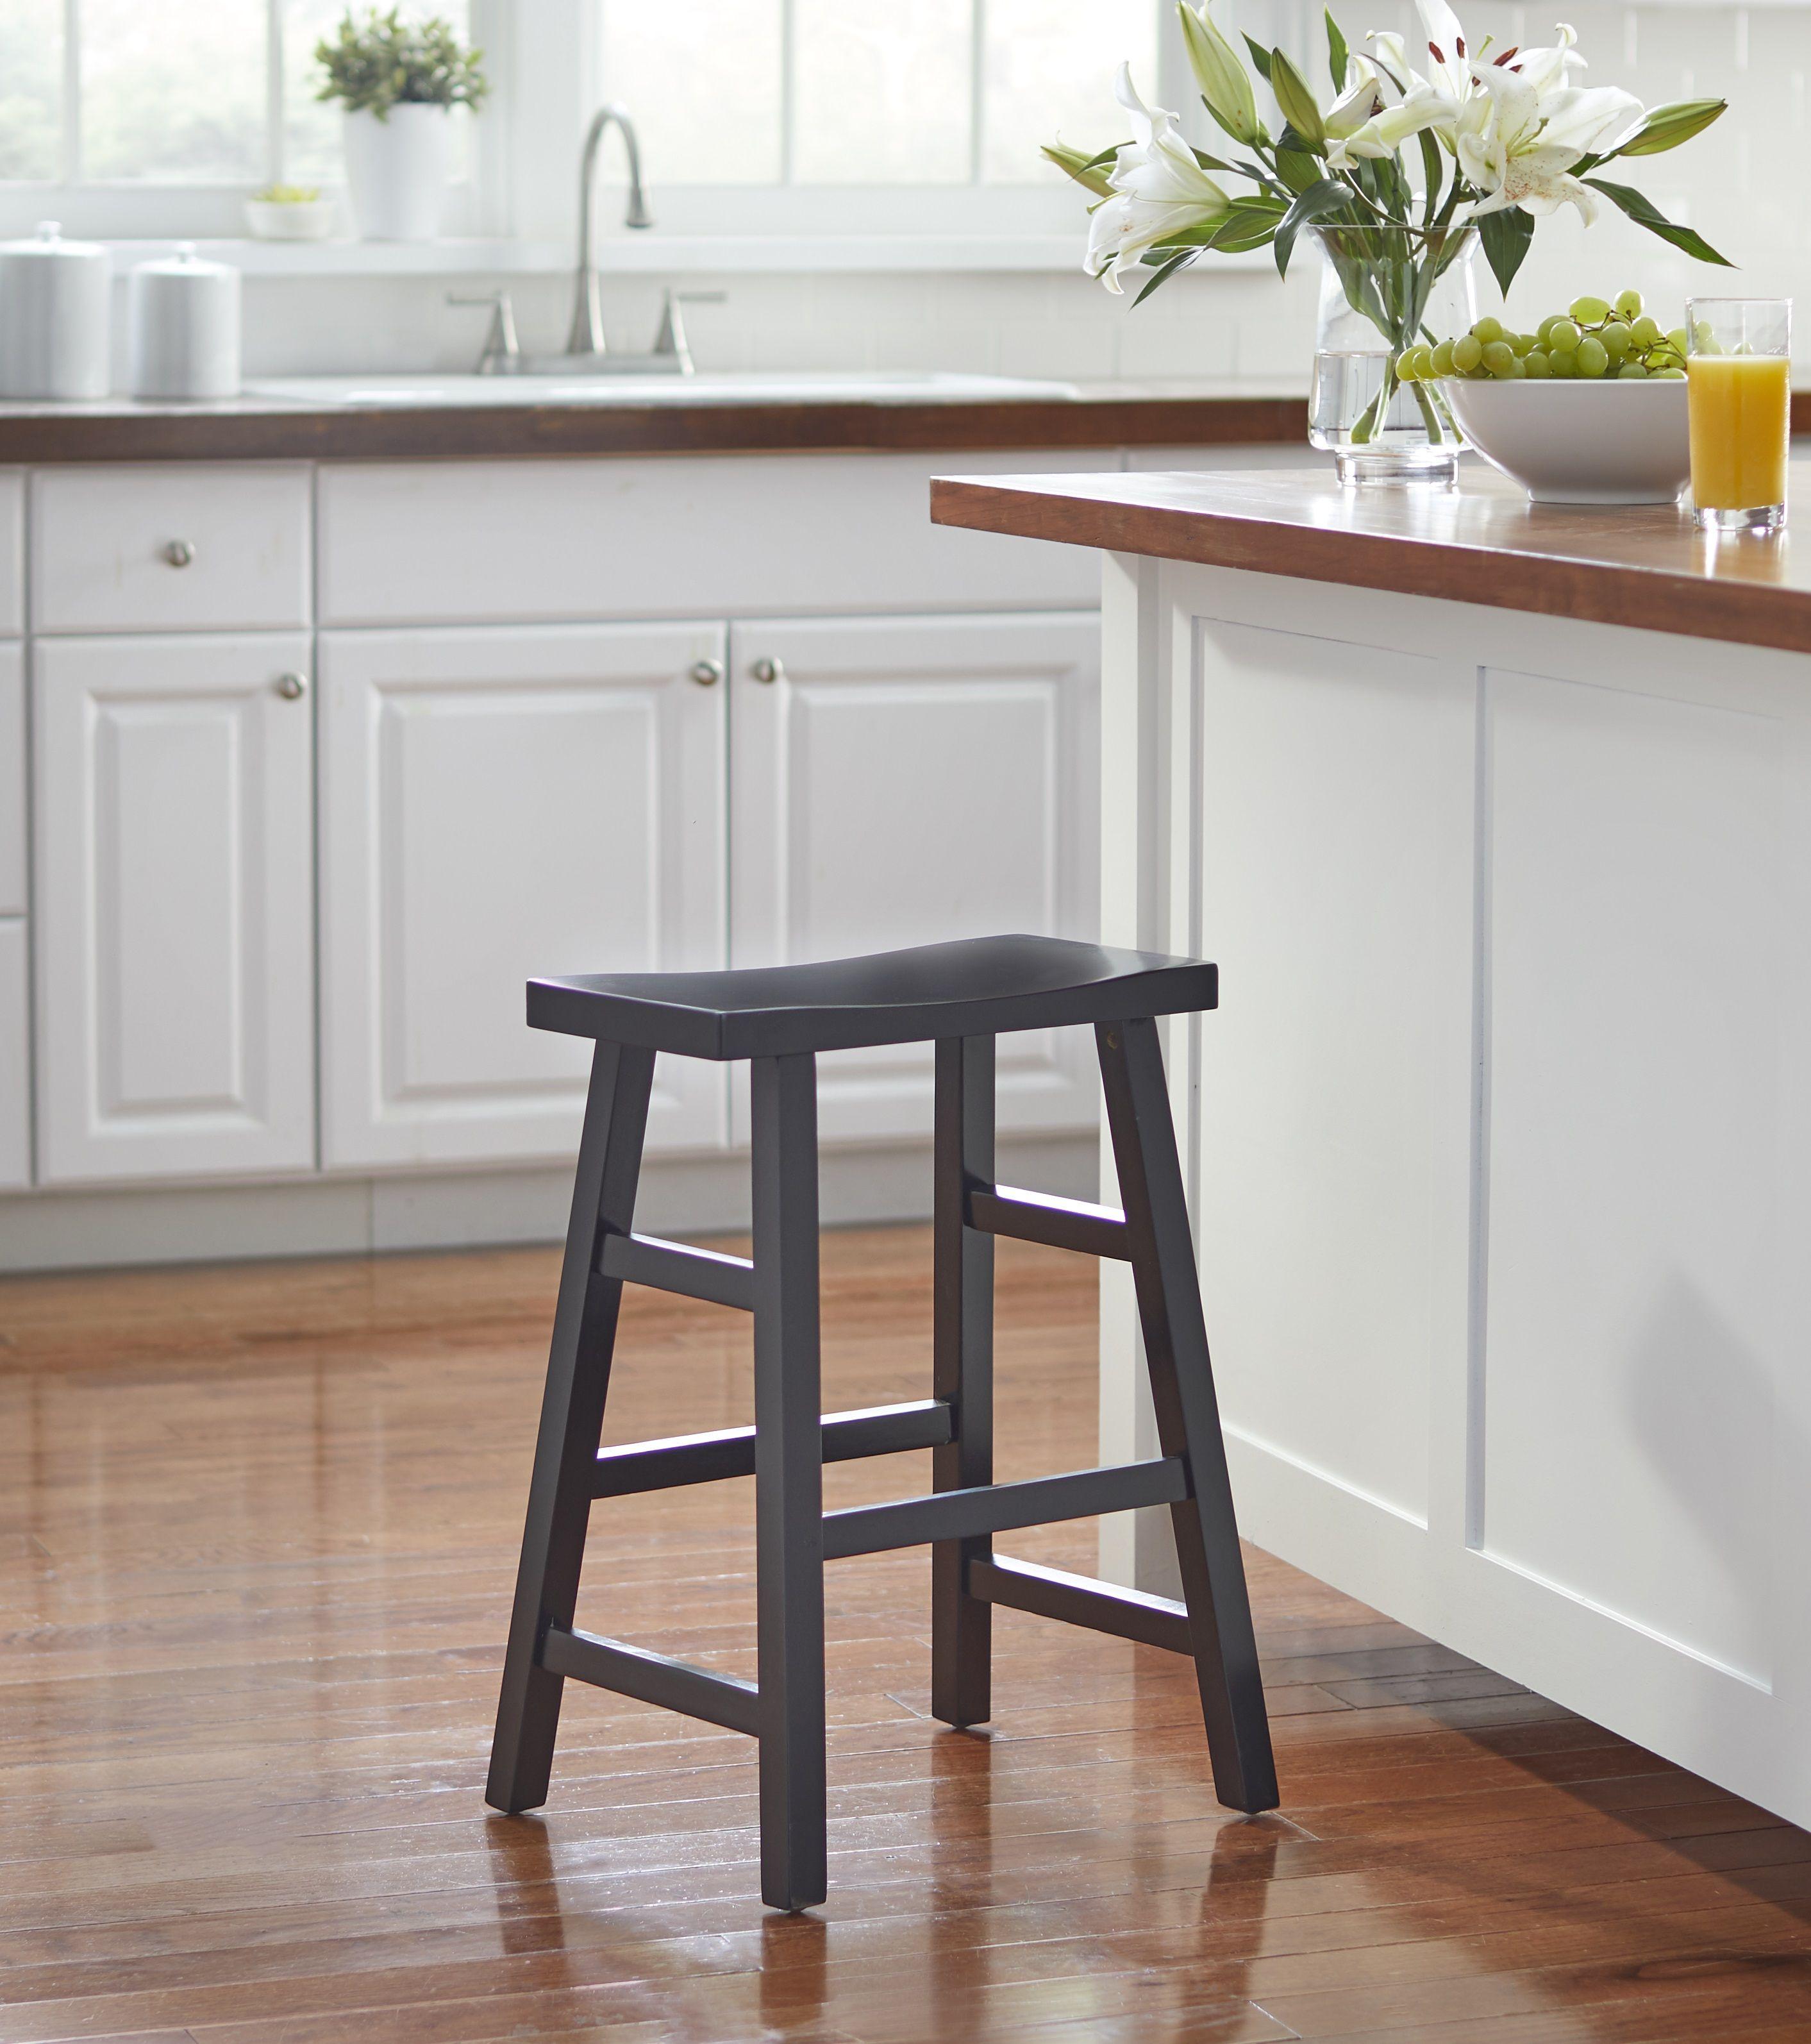 Mainstays Counter Height Saddle Bar Stool 24 Black Walmart Com In 2021 Bar Stools Saddle Bar Stools Bar Stools Kitchen Island